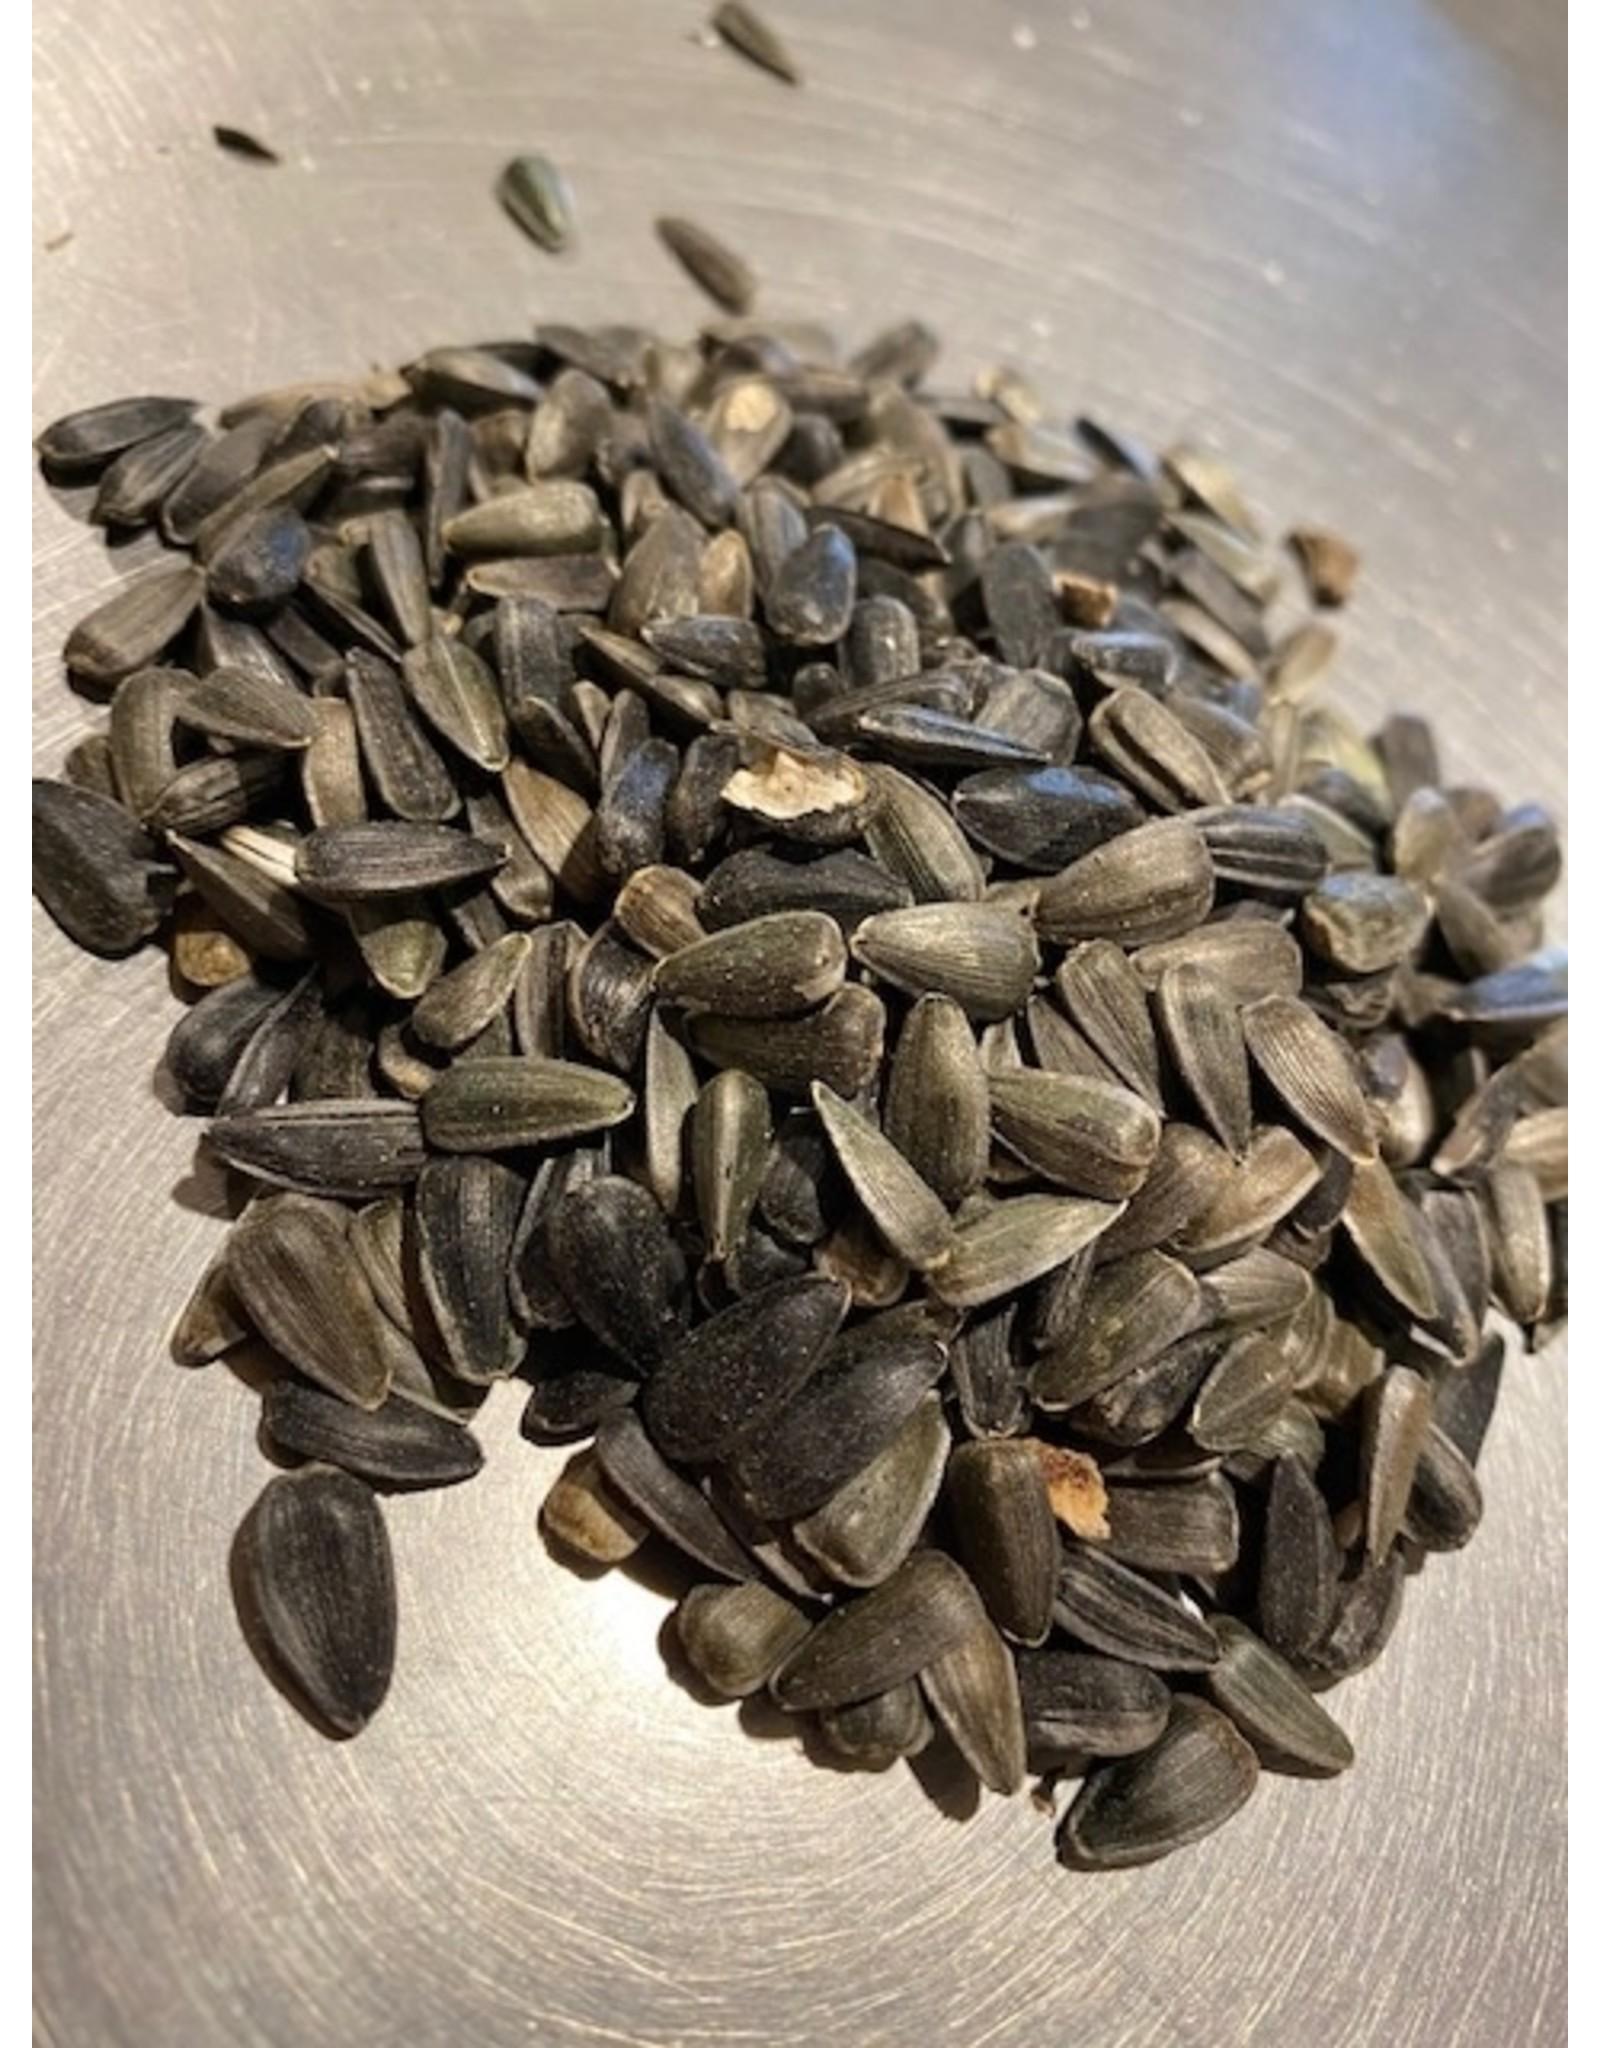 Mill Creek/Seed BO44 Black Oil 44lb